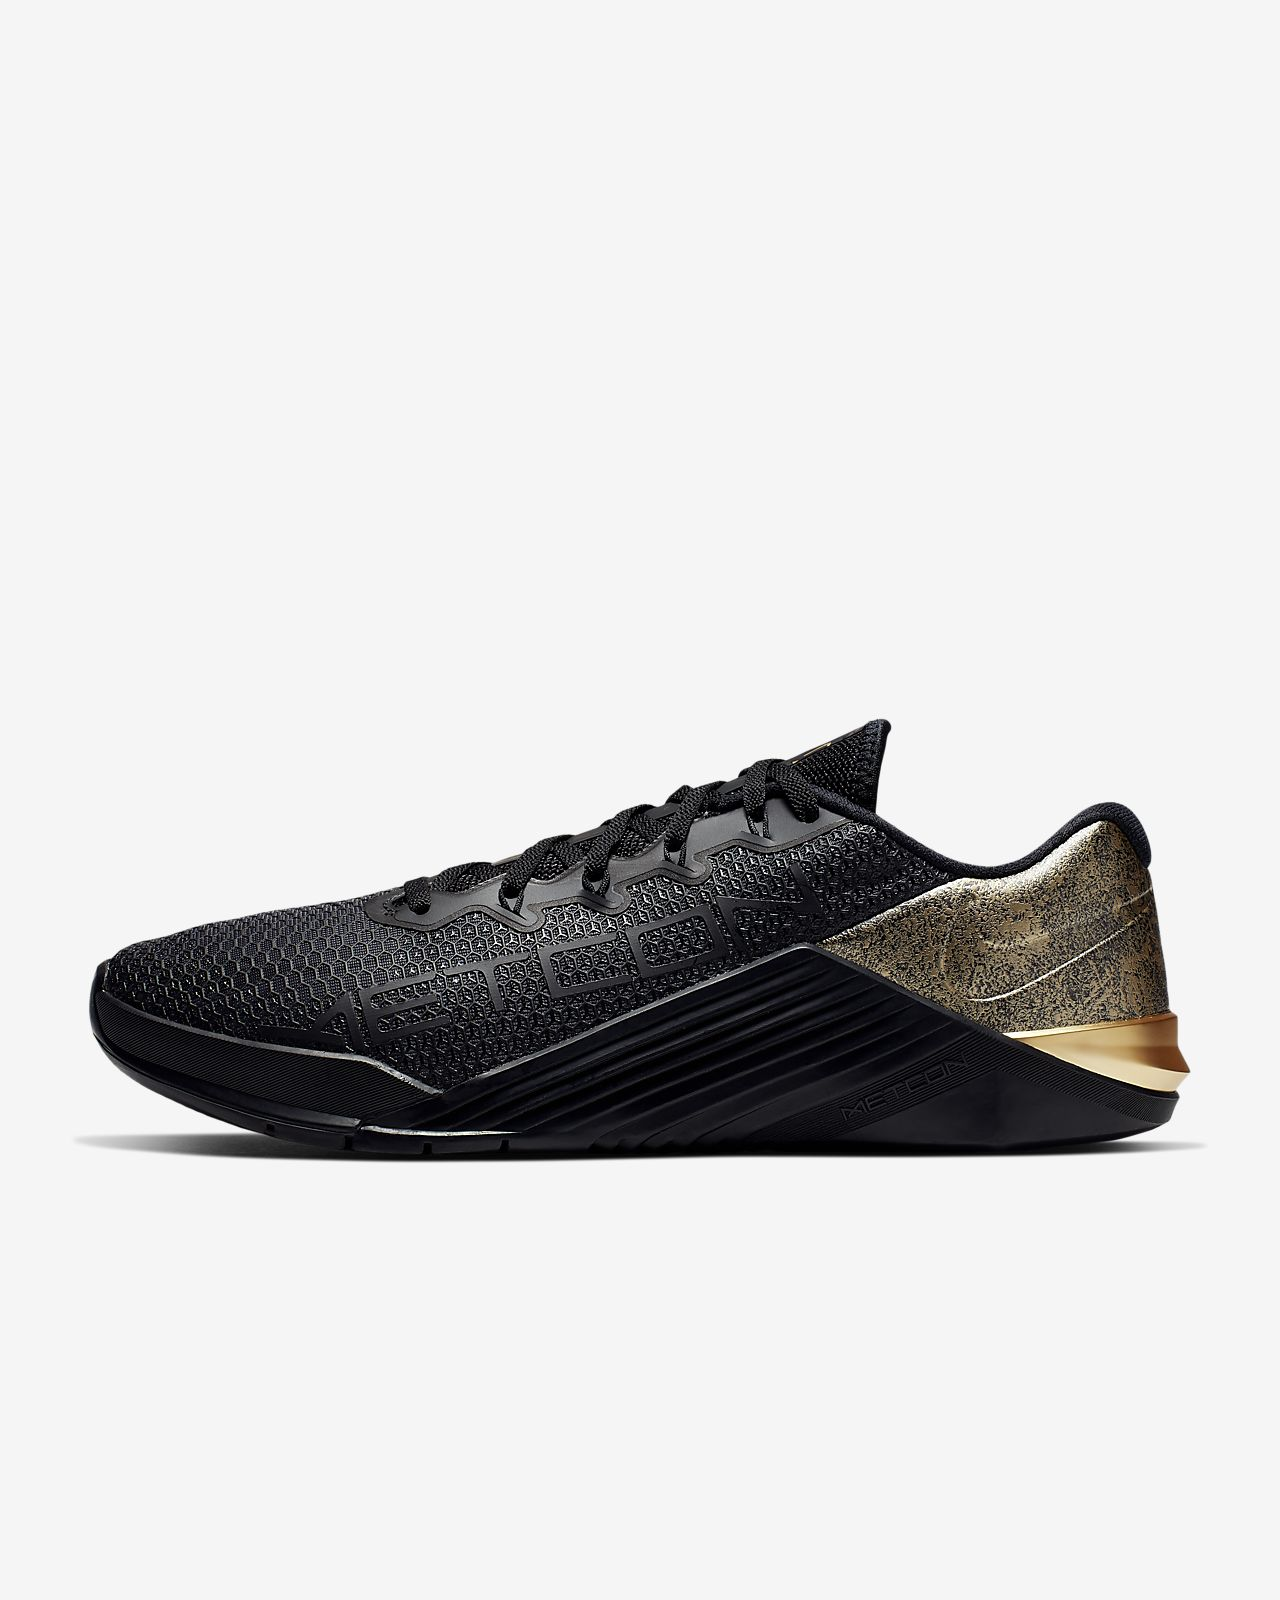 Nike Metcon 5 Black x Gold Training Shoe